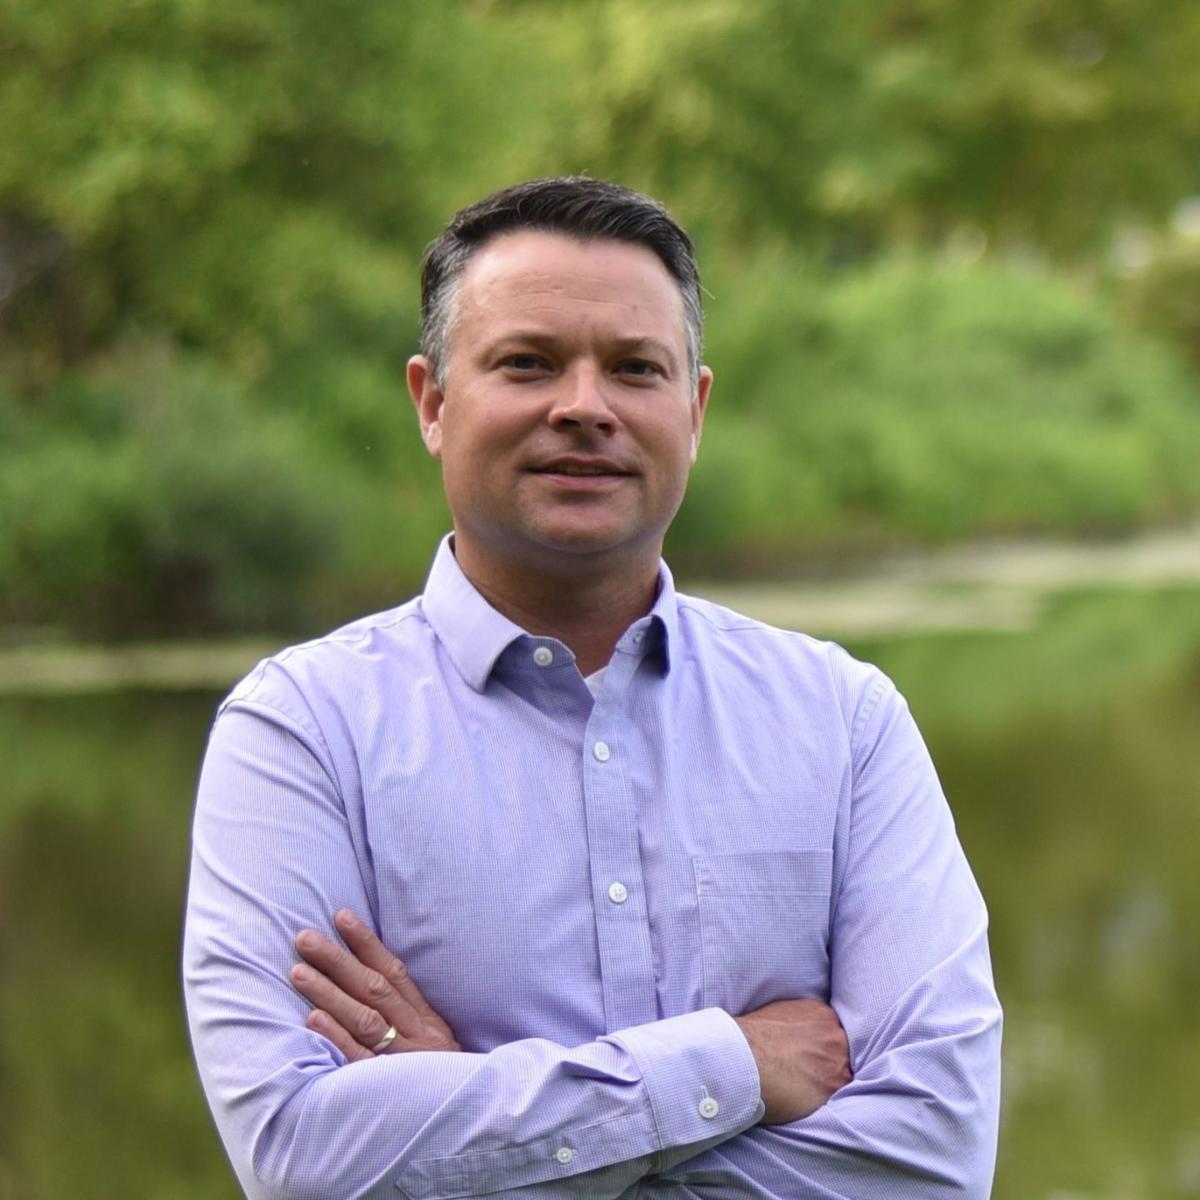 Former state legislator elected president of Missouri AFL-CIO